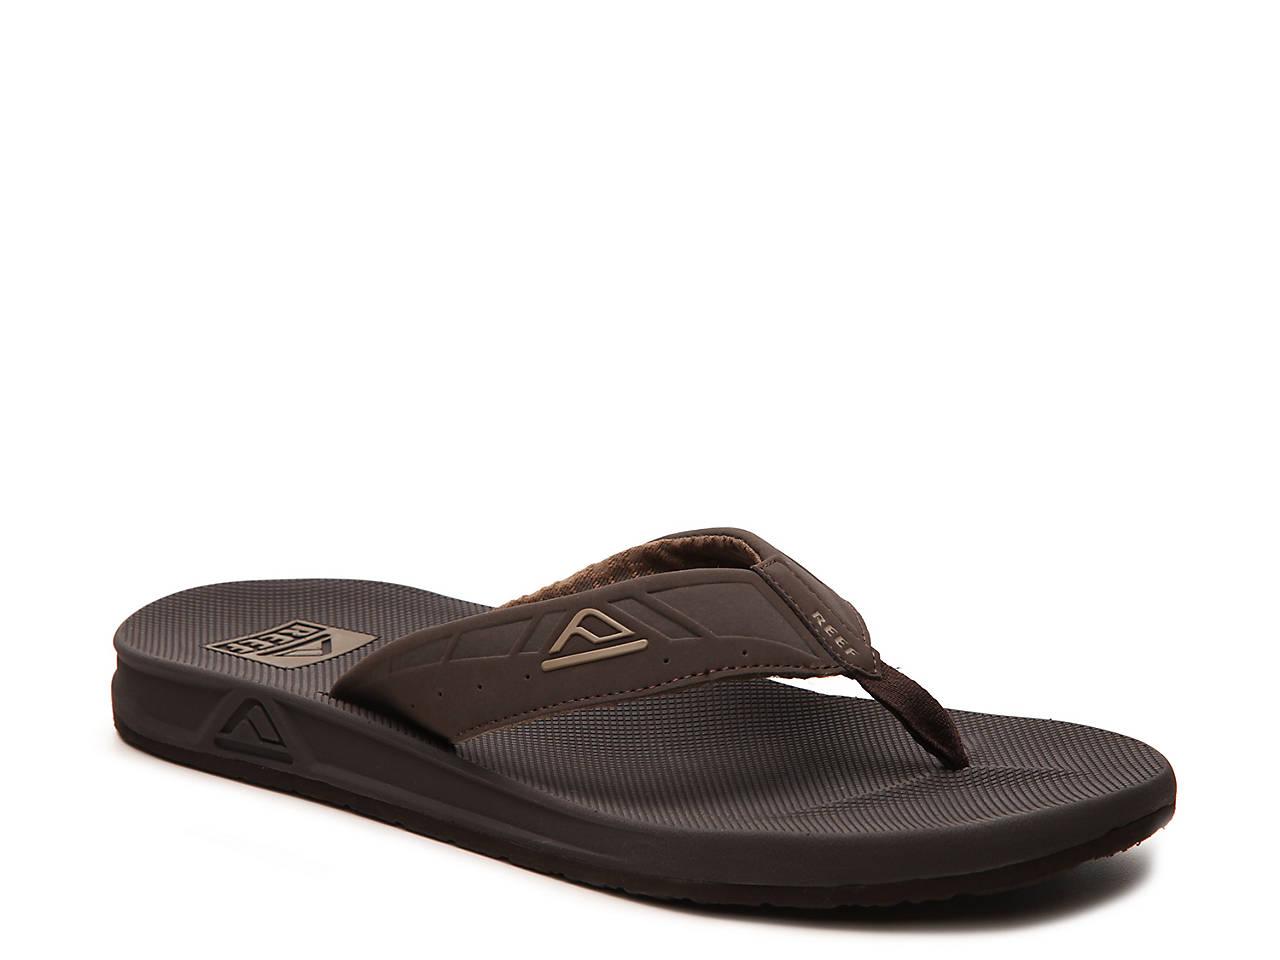 5a66669df61b Reef Phantom Flip Flop Men s Shoes